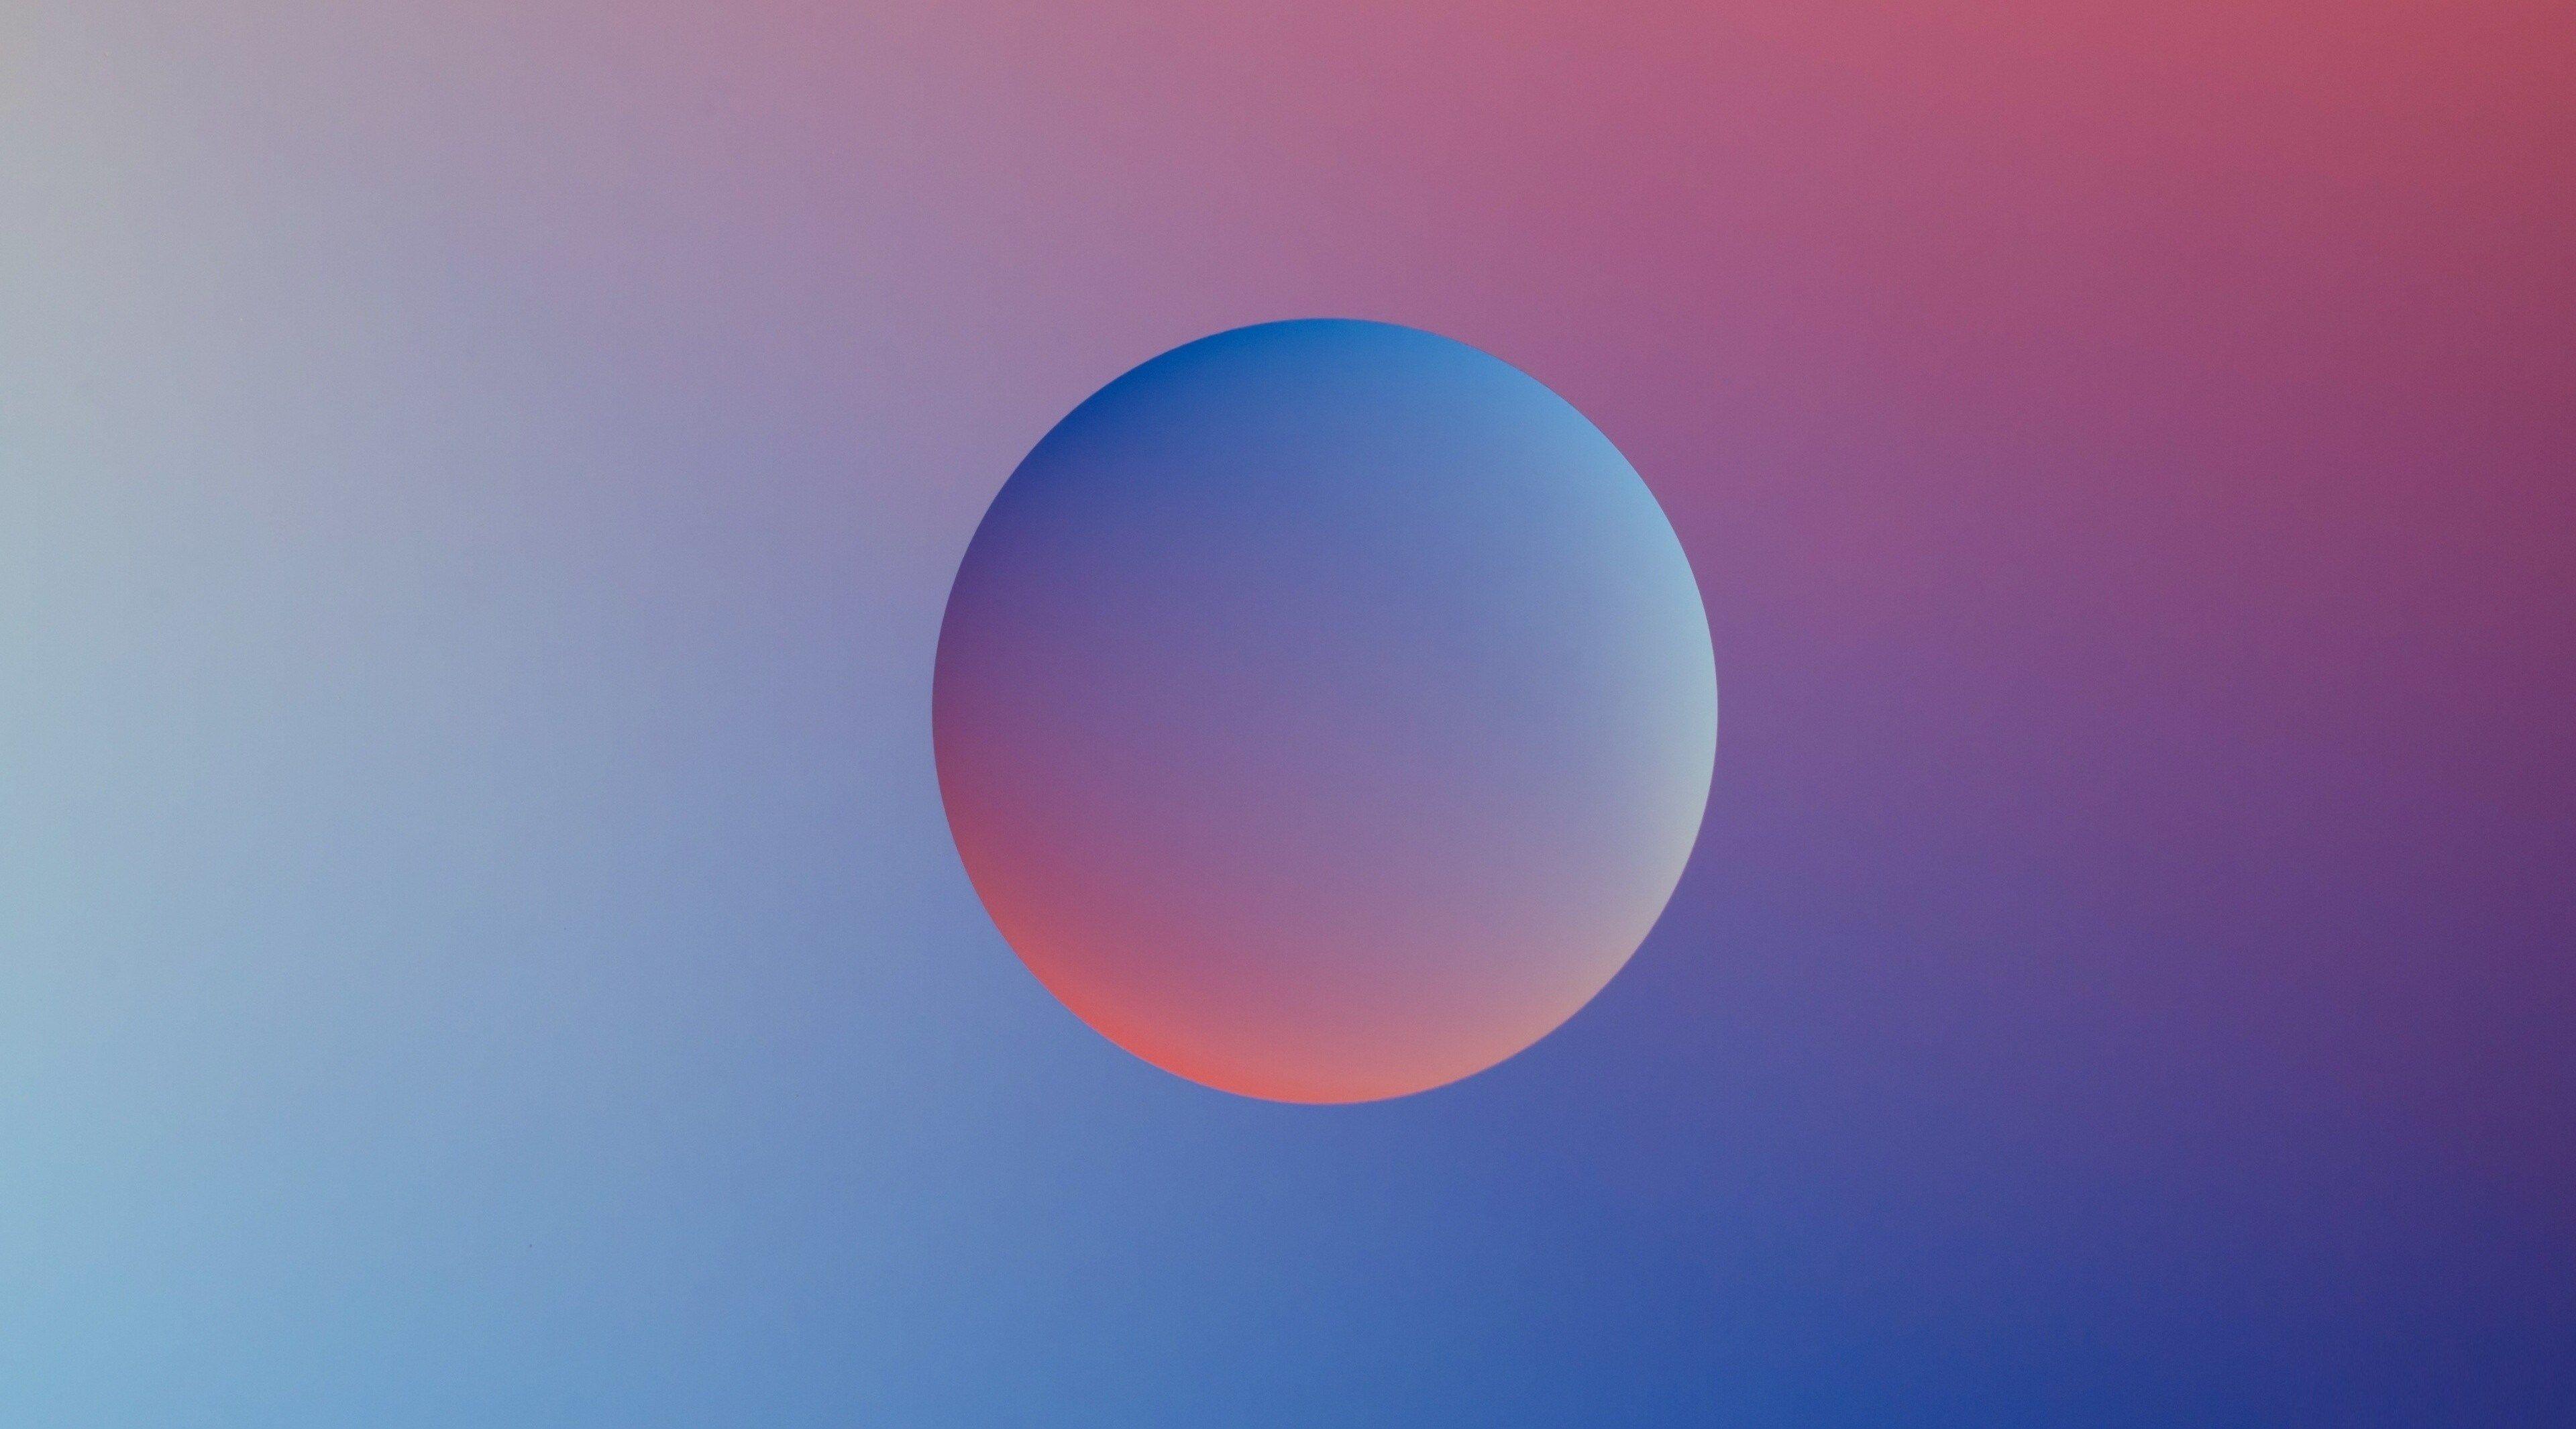 3840x2130 Drop 4k Hd Wallpaper Download For Pc In 2020 Imac Wallpaper Mac Wallpaper Retina Mac Wallpaper